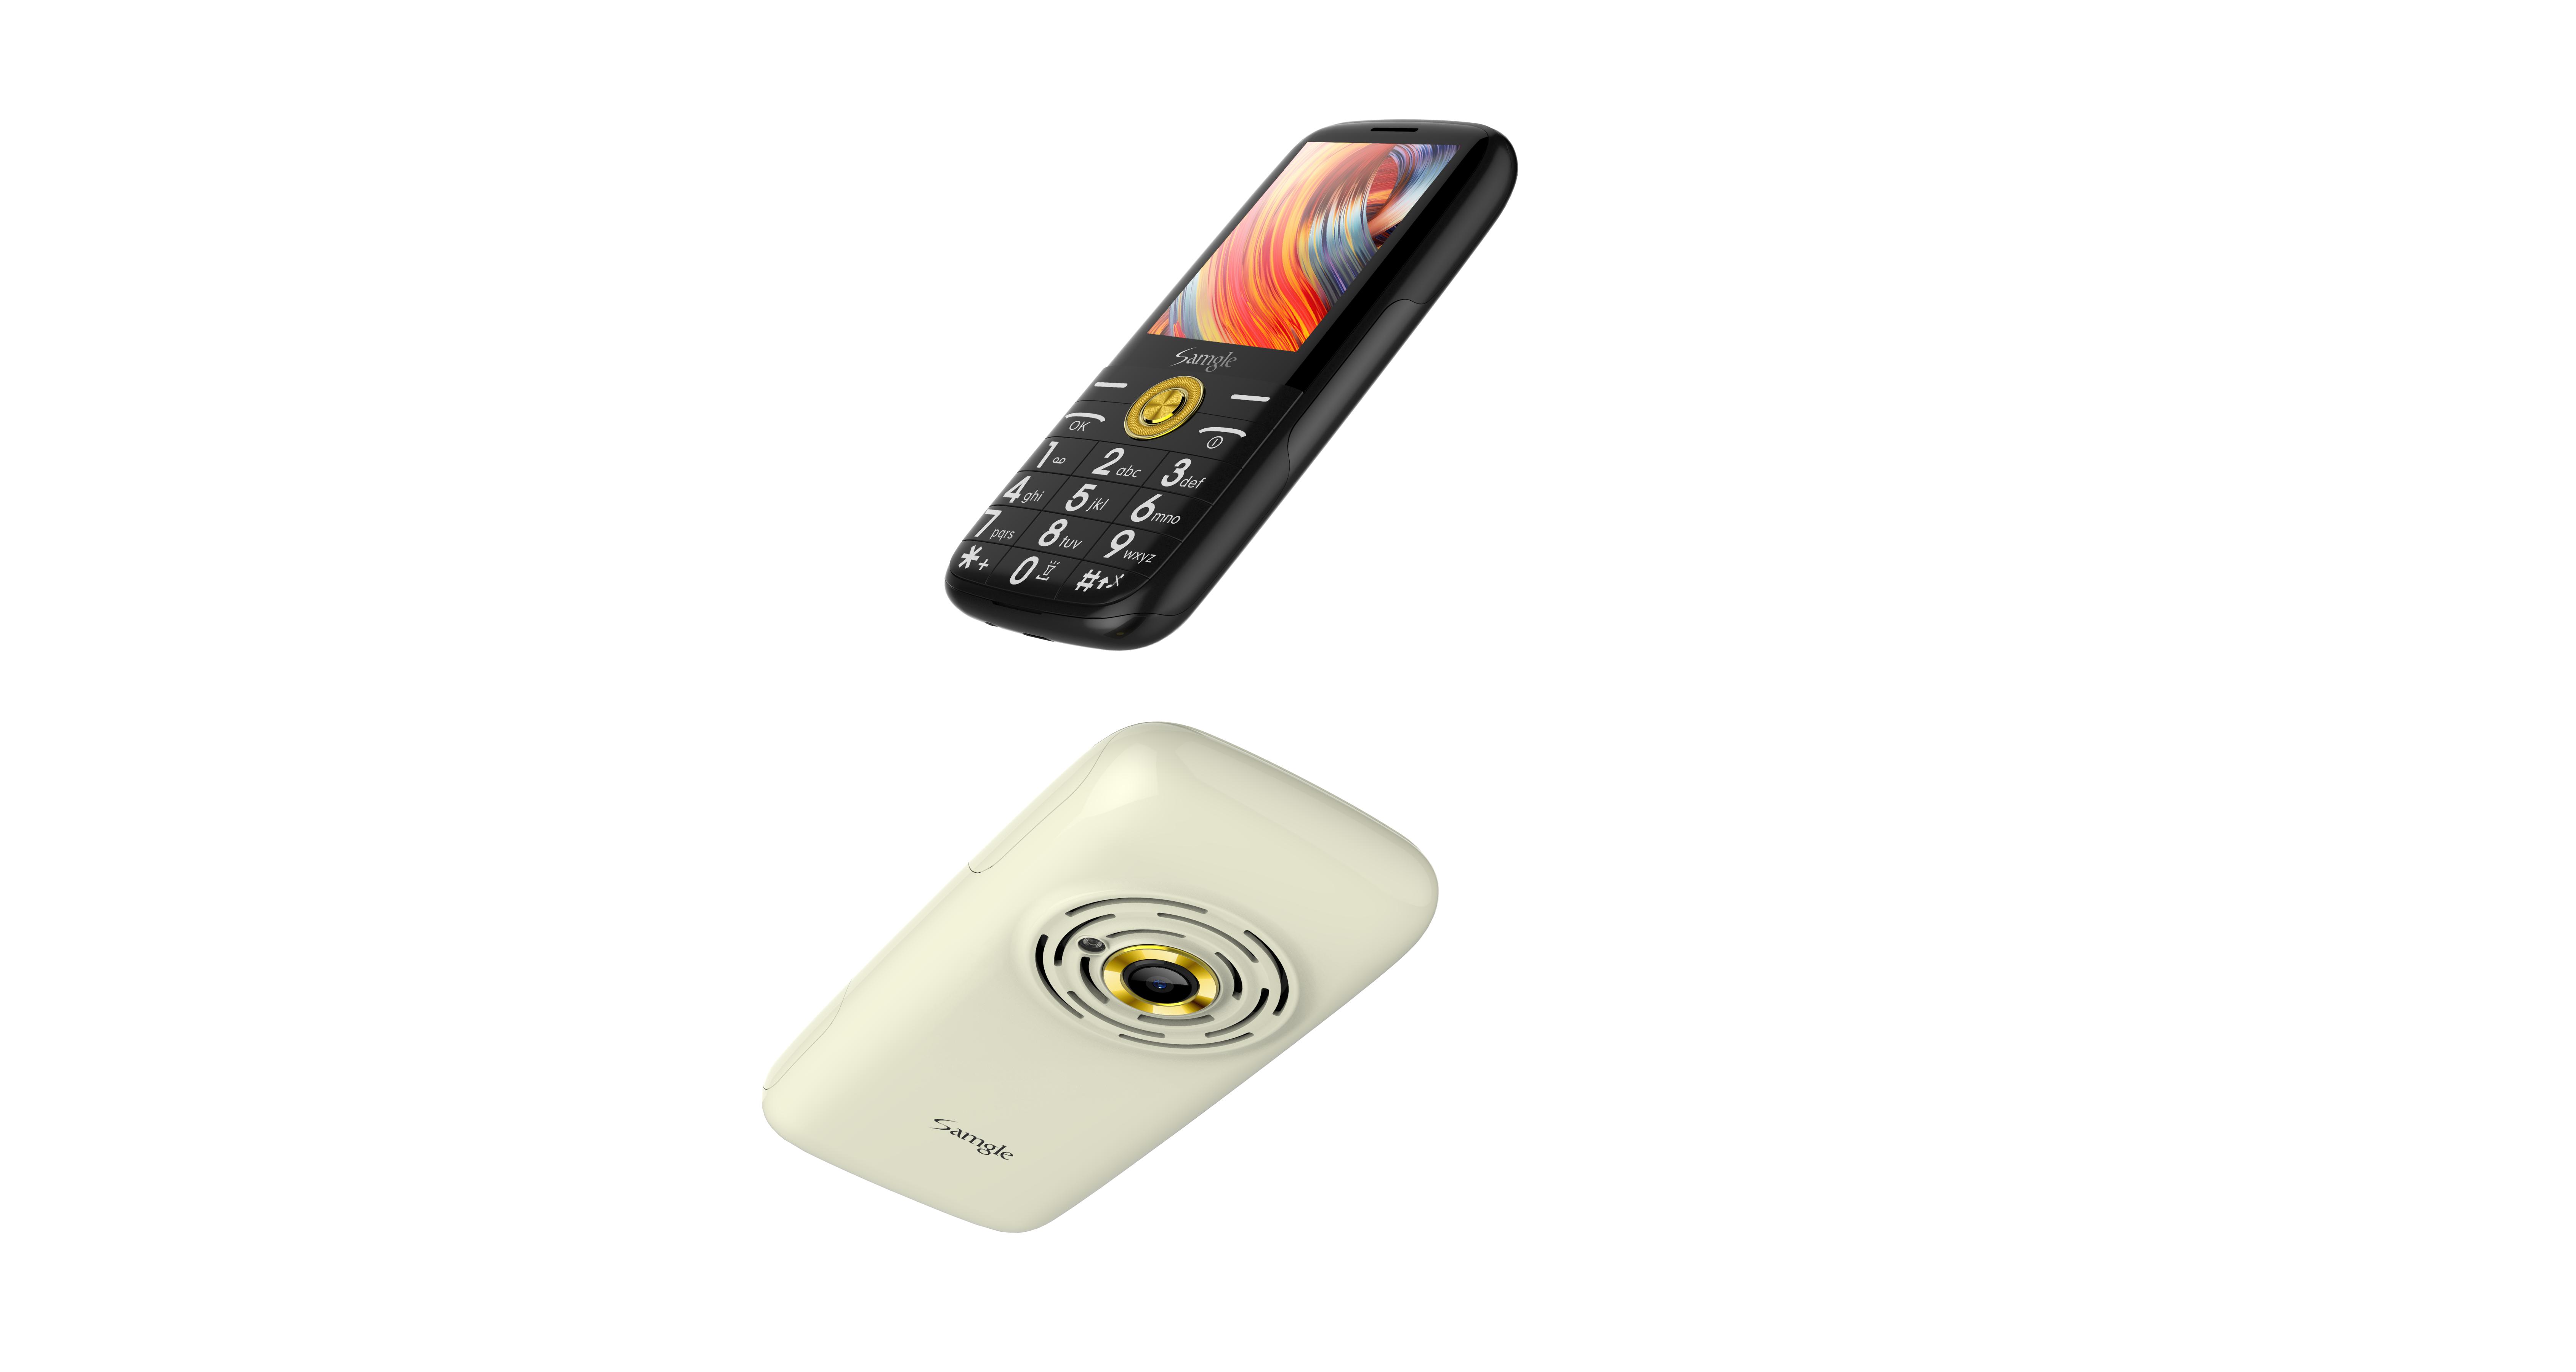 Telefon mobil Samgle Captain 3G, QVGA 2.4 inch, Bluetooth, Digi 3G, Camera, Slot Card, Radio FM, Internet, Dual SIM19